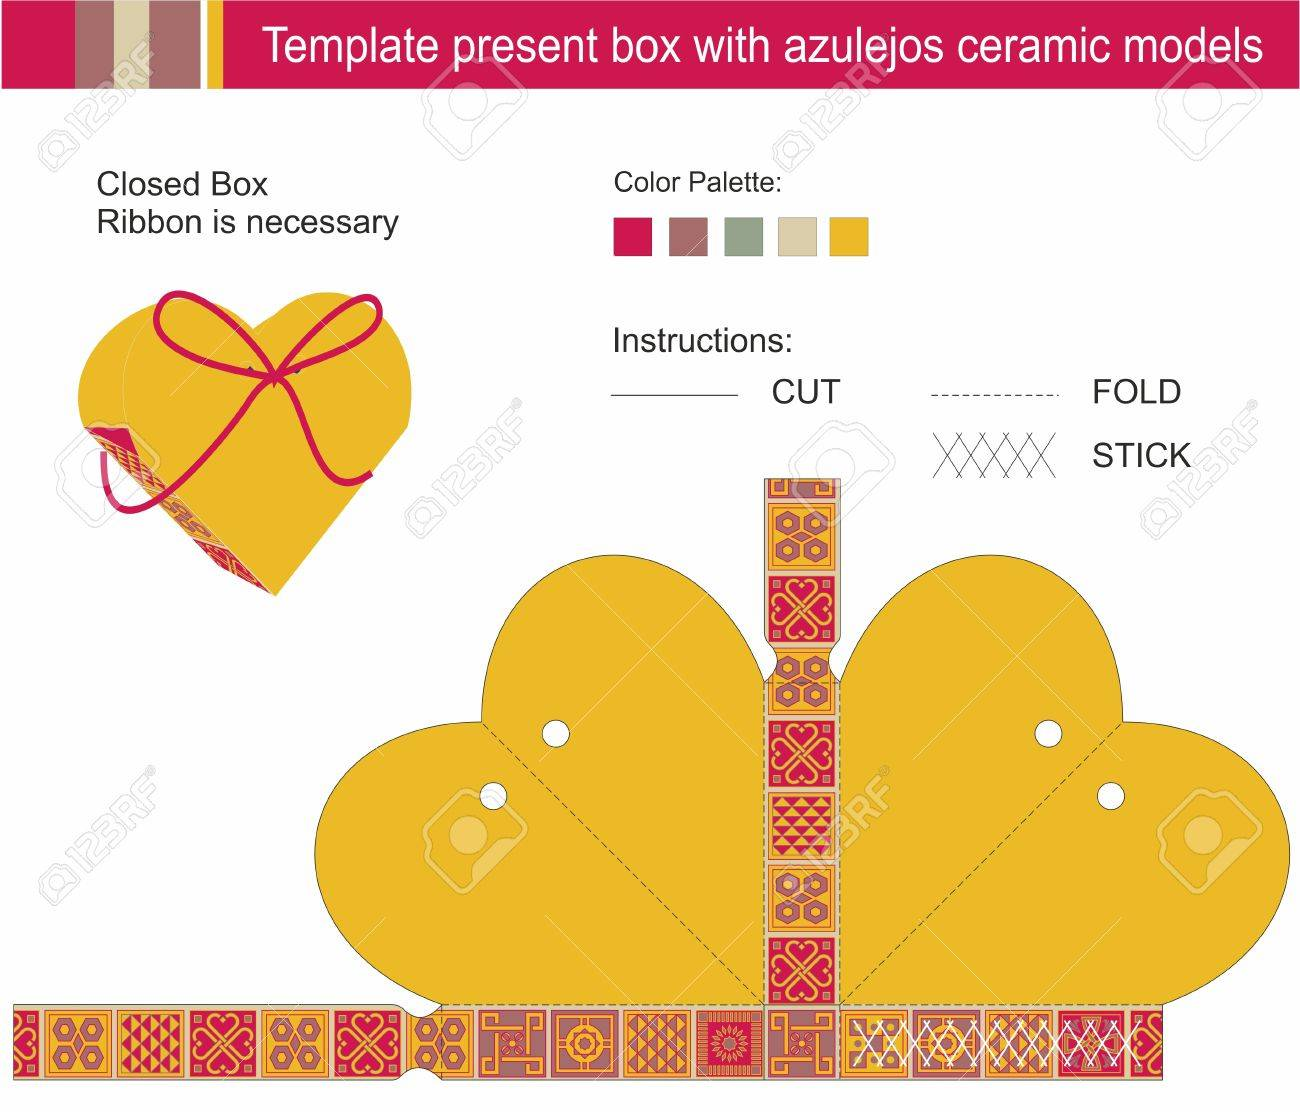 template present box in heart shape azulejos ceramic models template present box in heart shape azulejos ceramic models stock vector 20950141